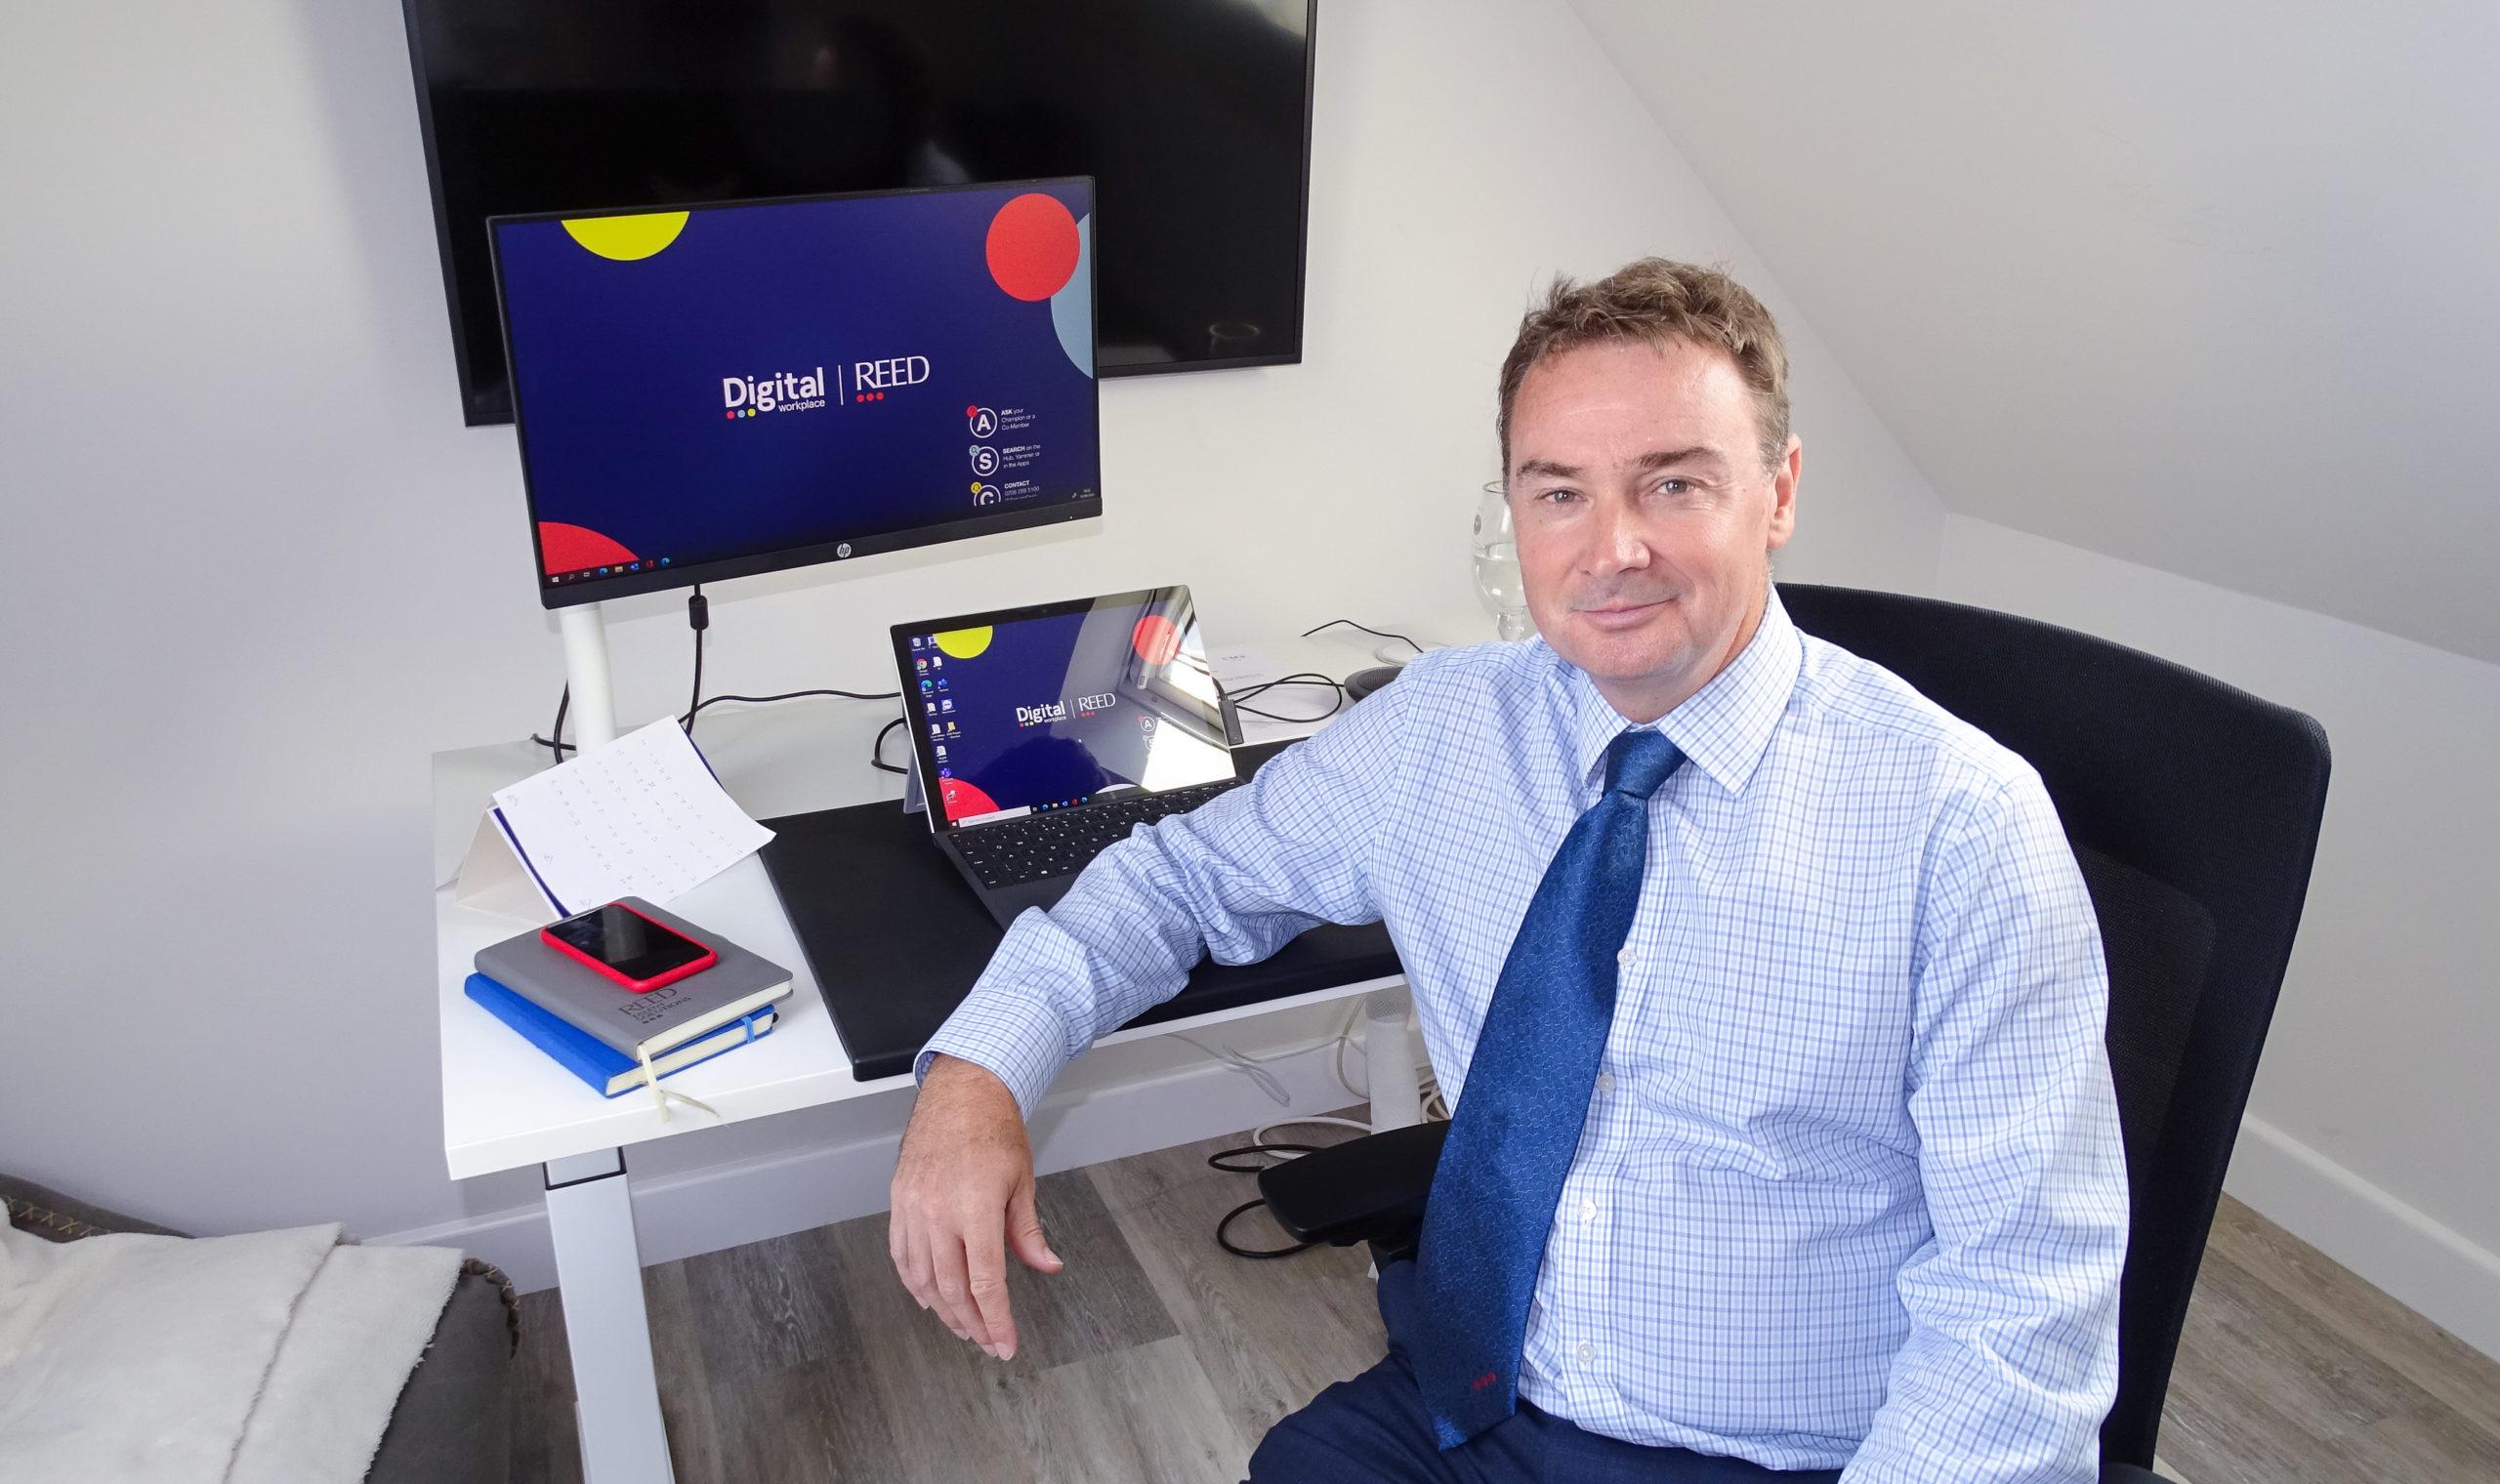 Ian Nicholas - MD of Reed Global with his home Digital Workplace setup